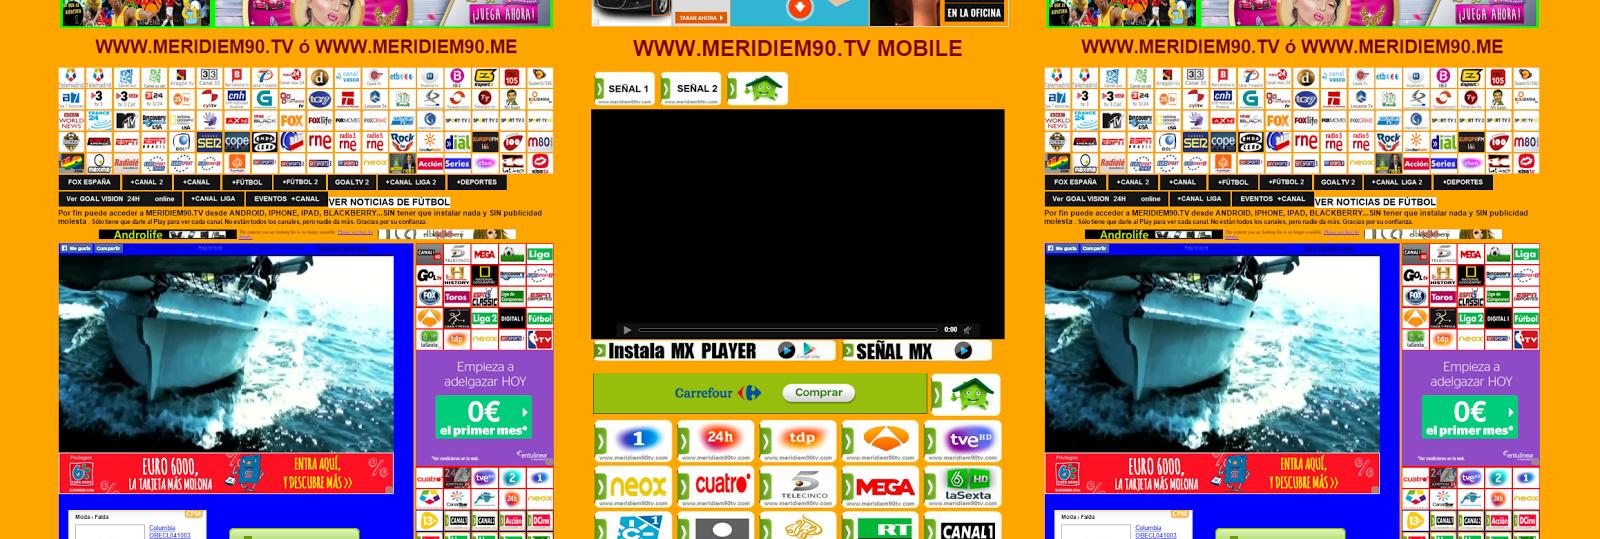 Meridiem 90 TV